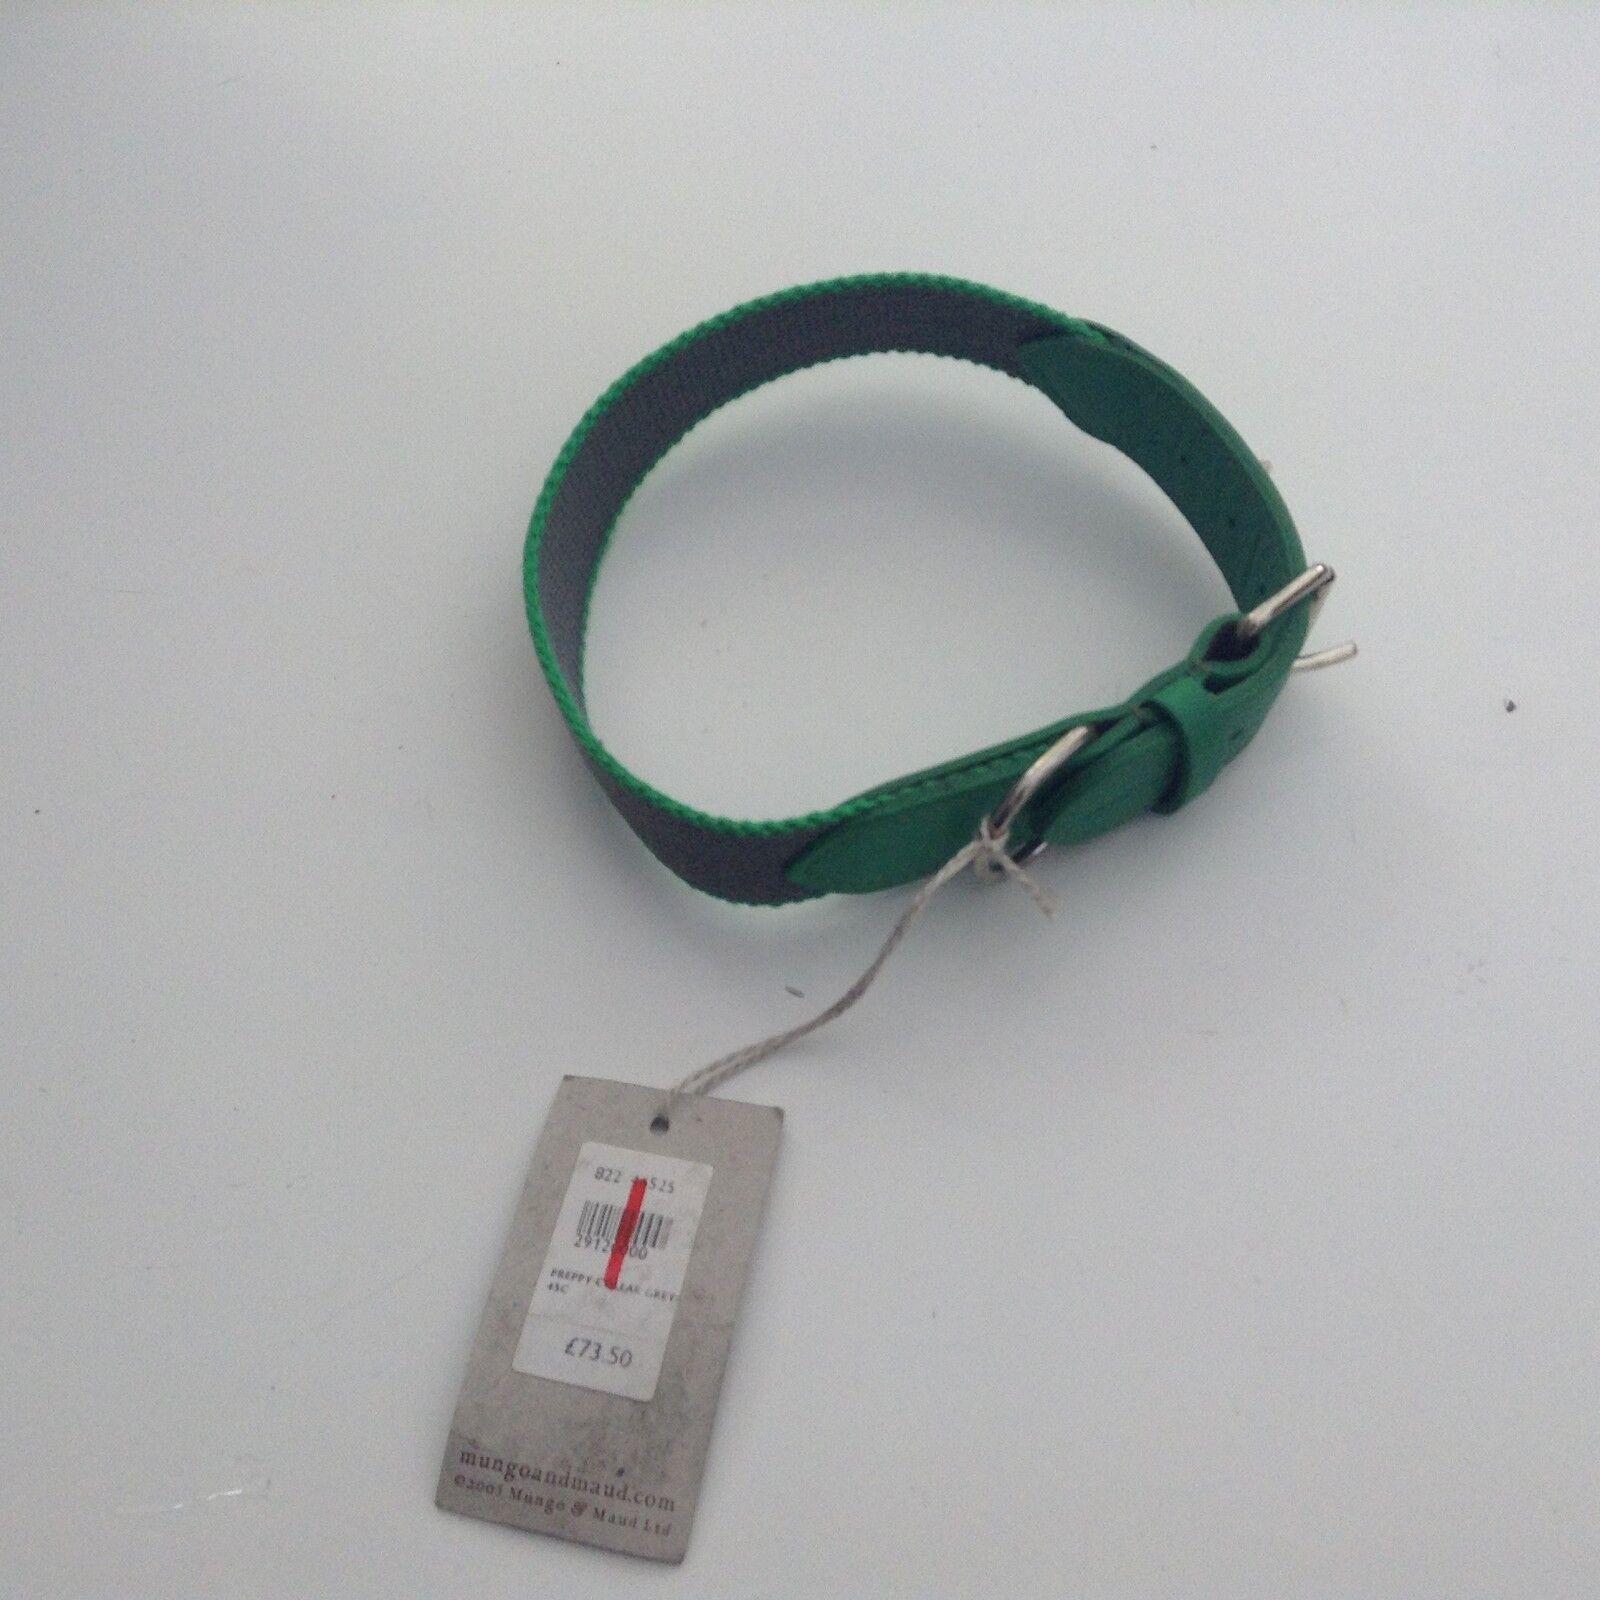 Mungo & Maud Preppy Dog Collar, Green, Medium, New RRP .50